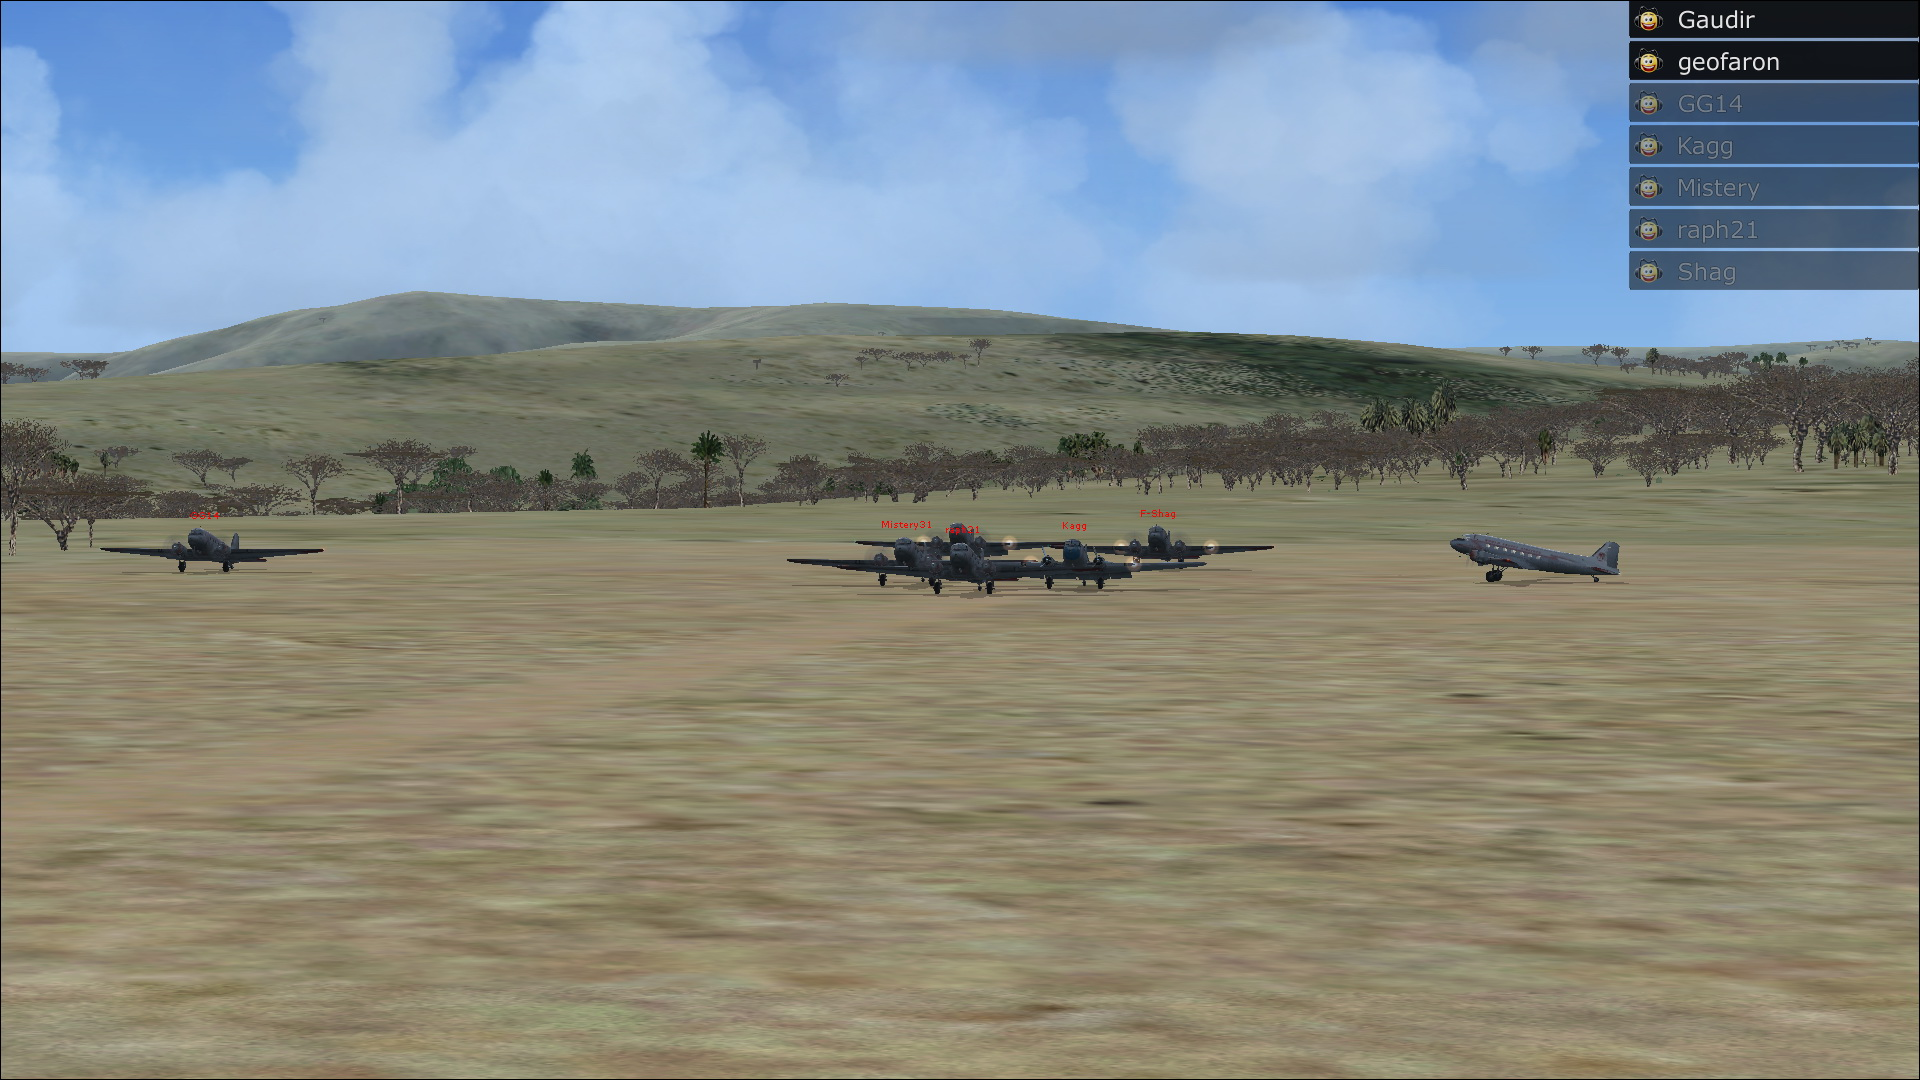 Vol en formation en Afrique (DC3) 133075201322222614301